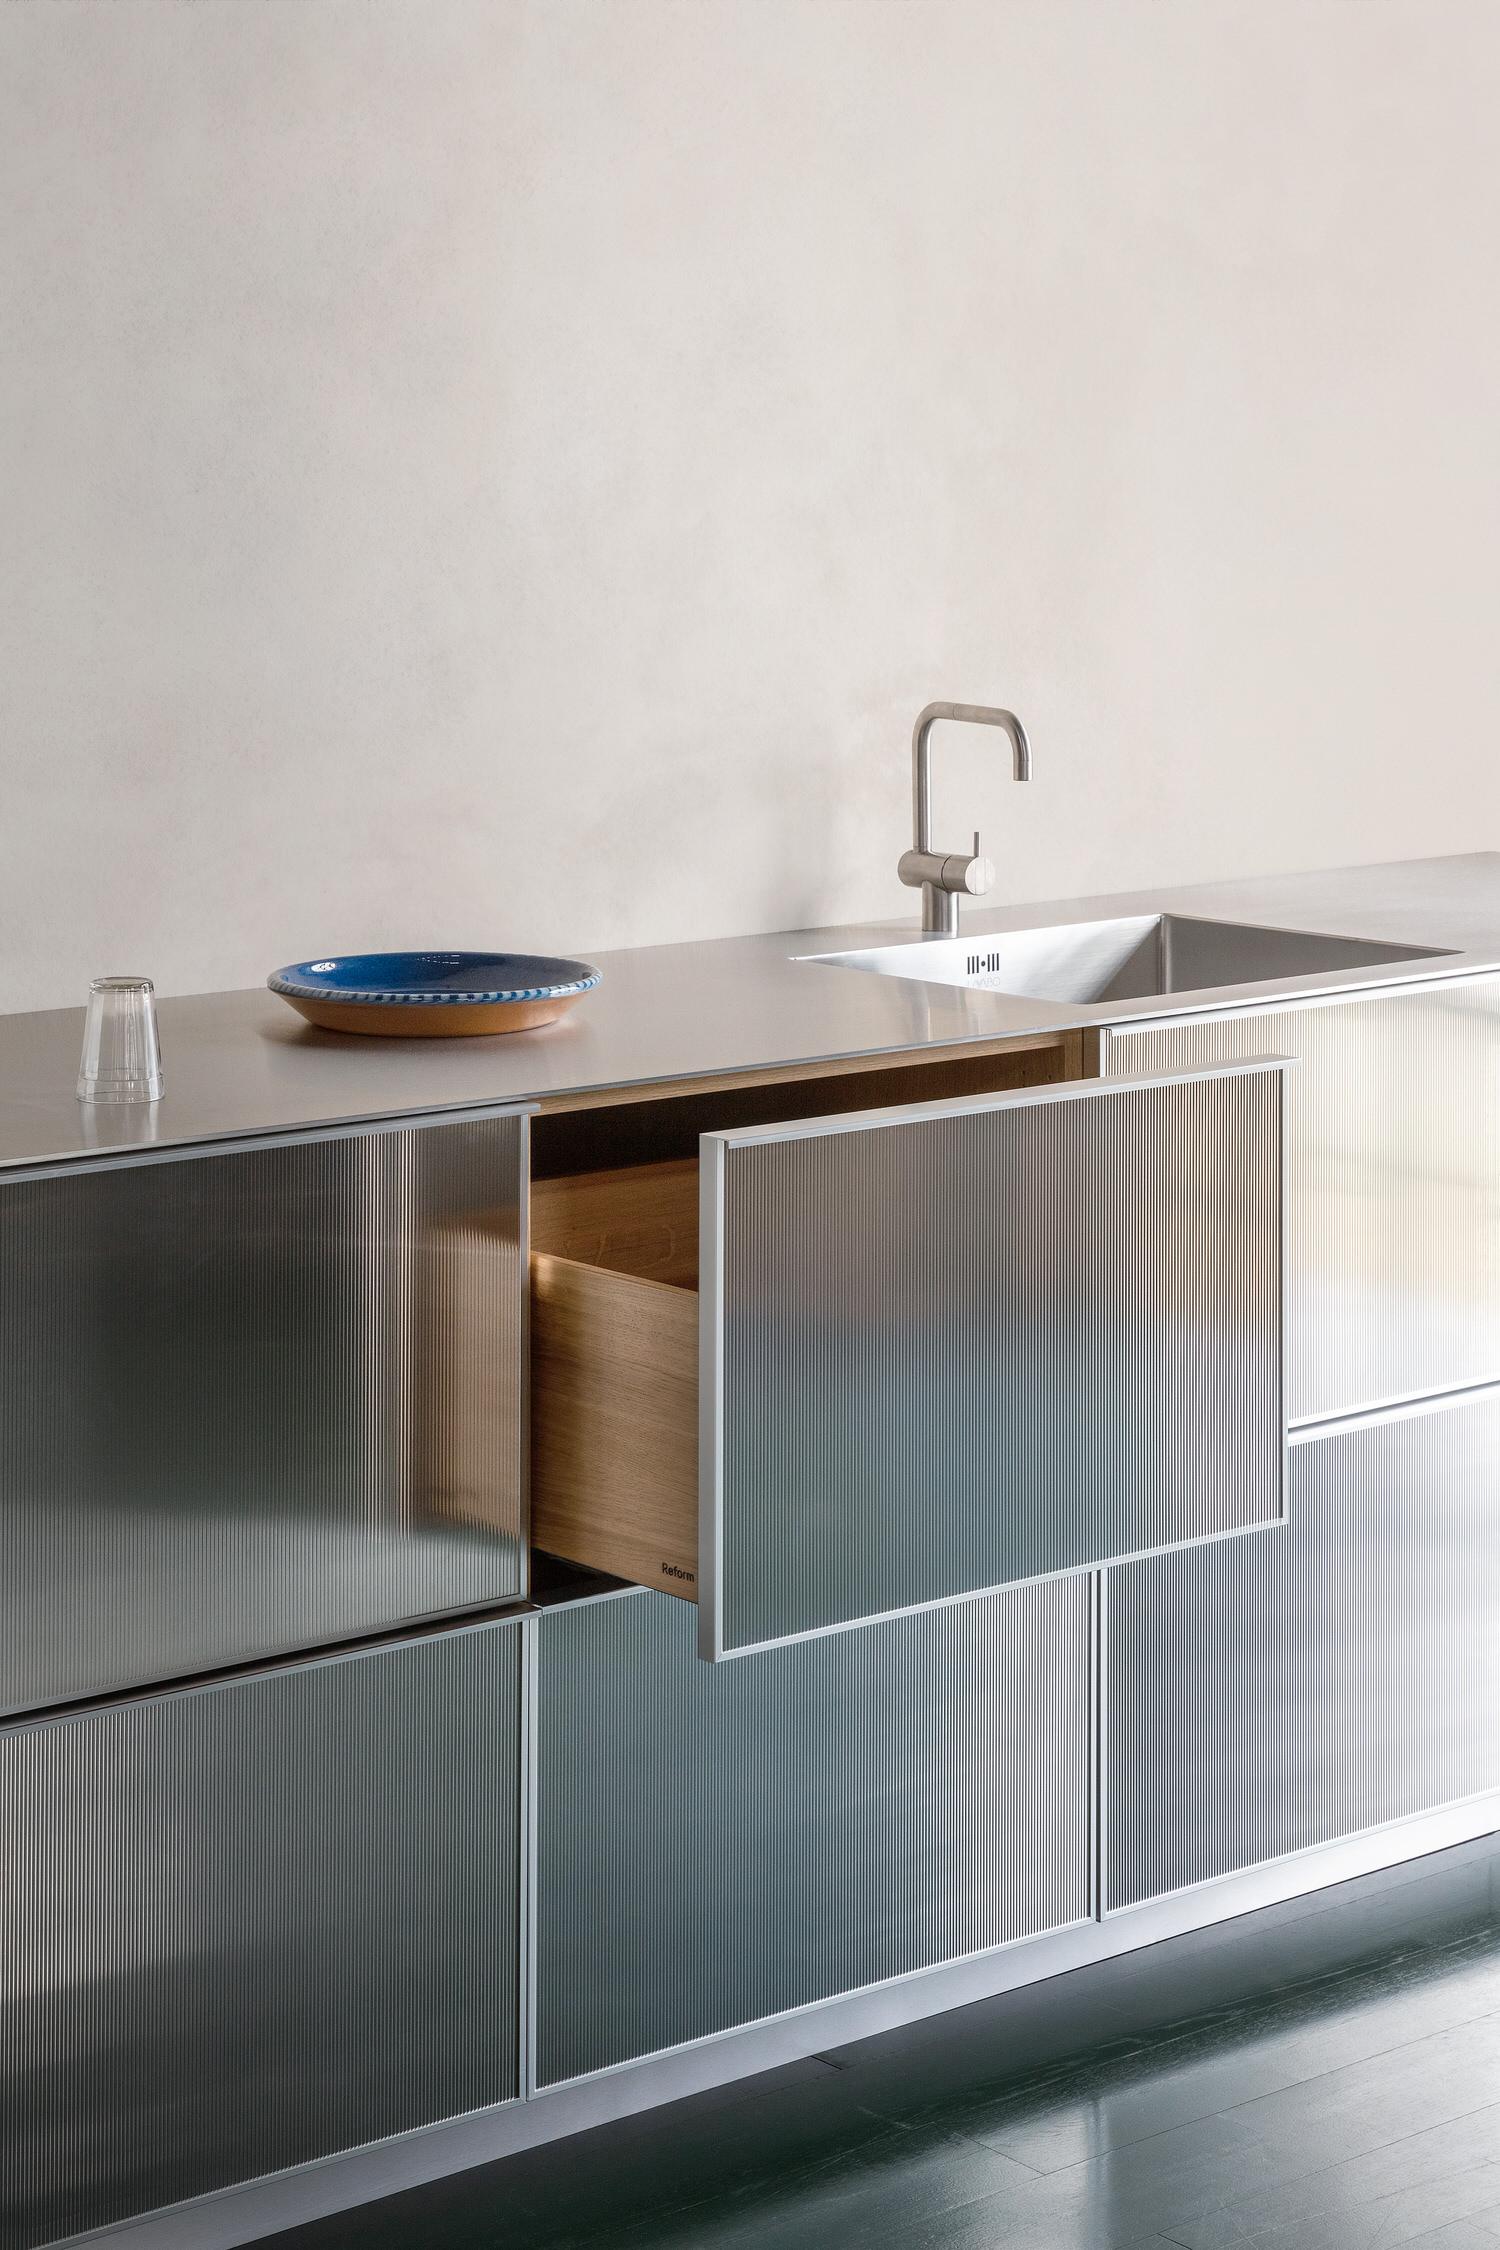 Jean Nouvel Reflect Reform Kitchen Design Yellowtrace 05